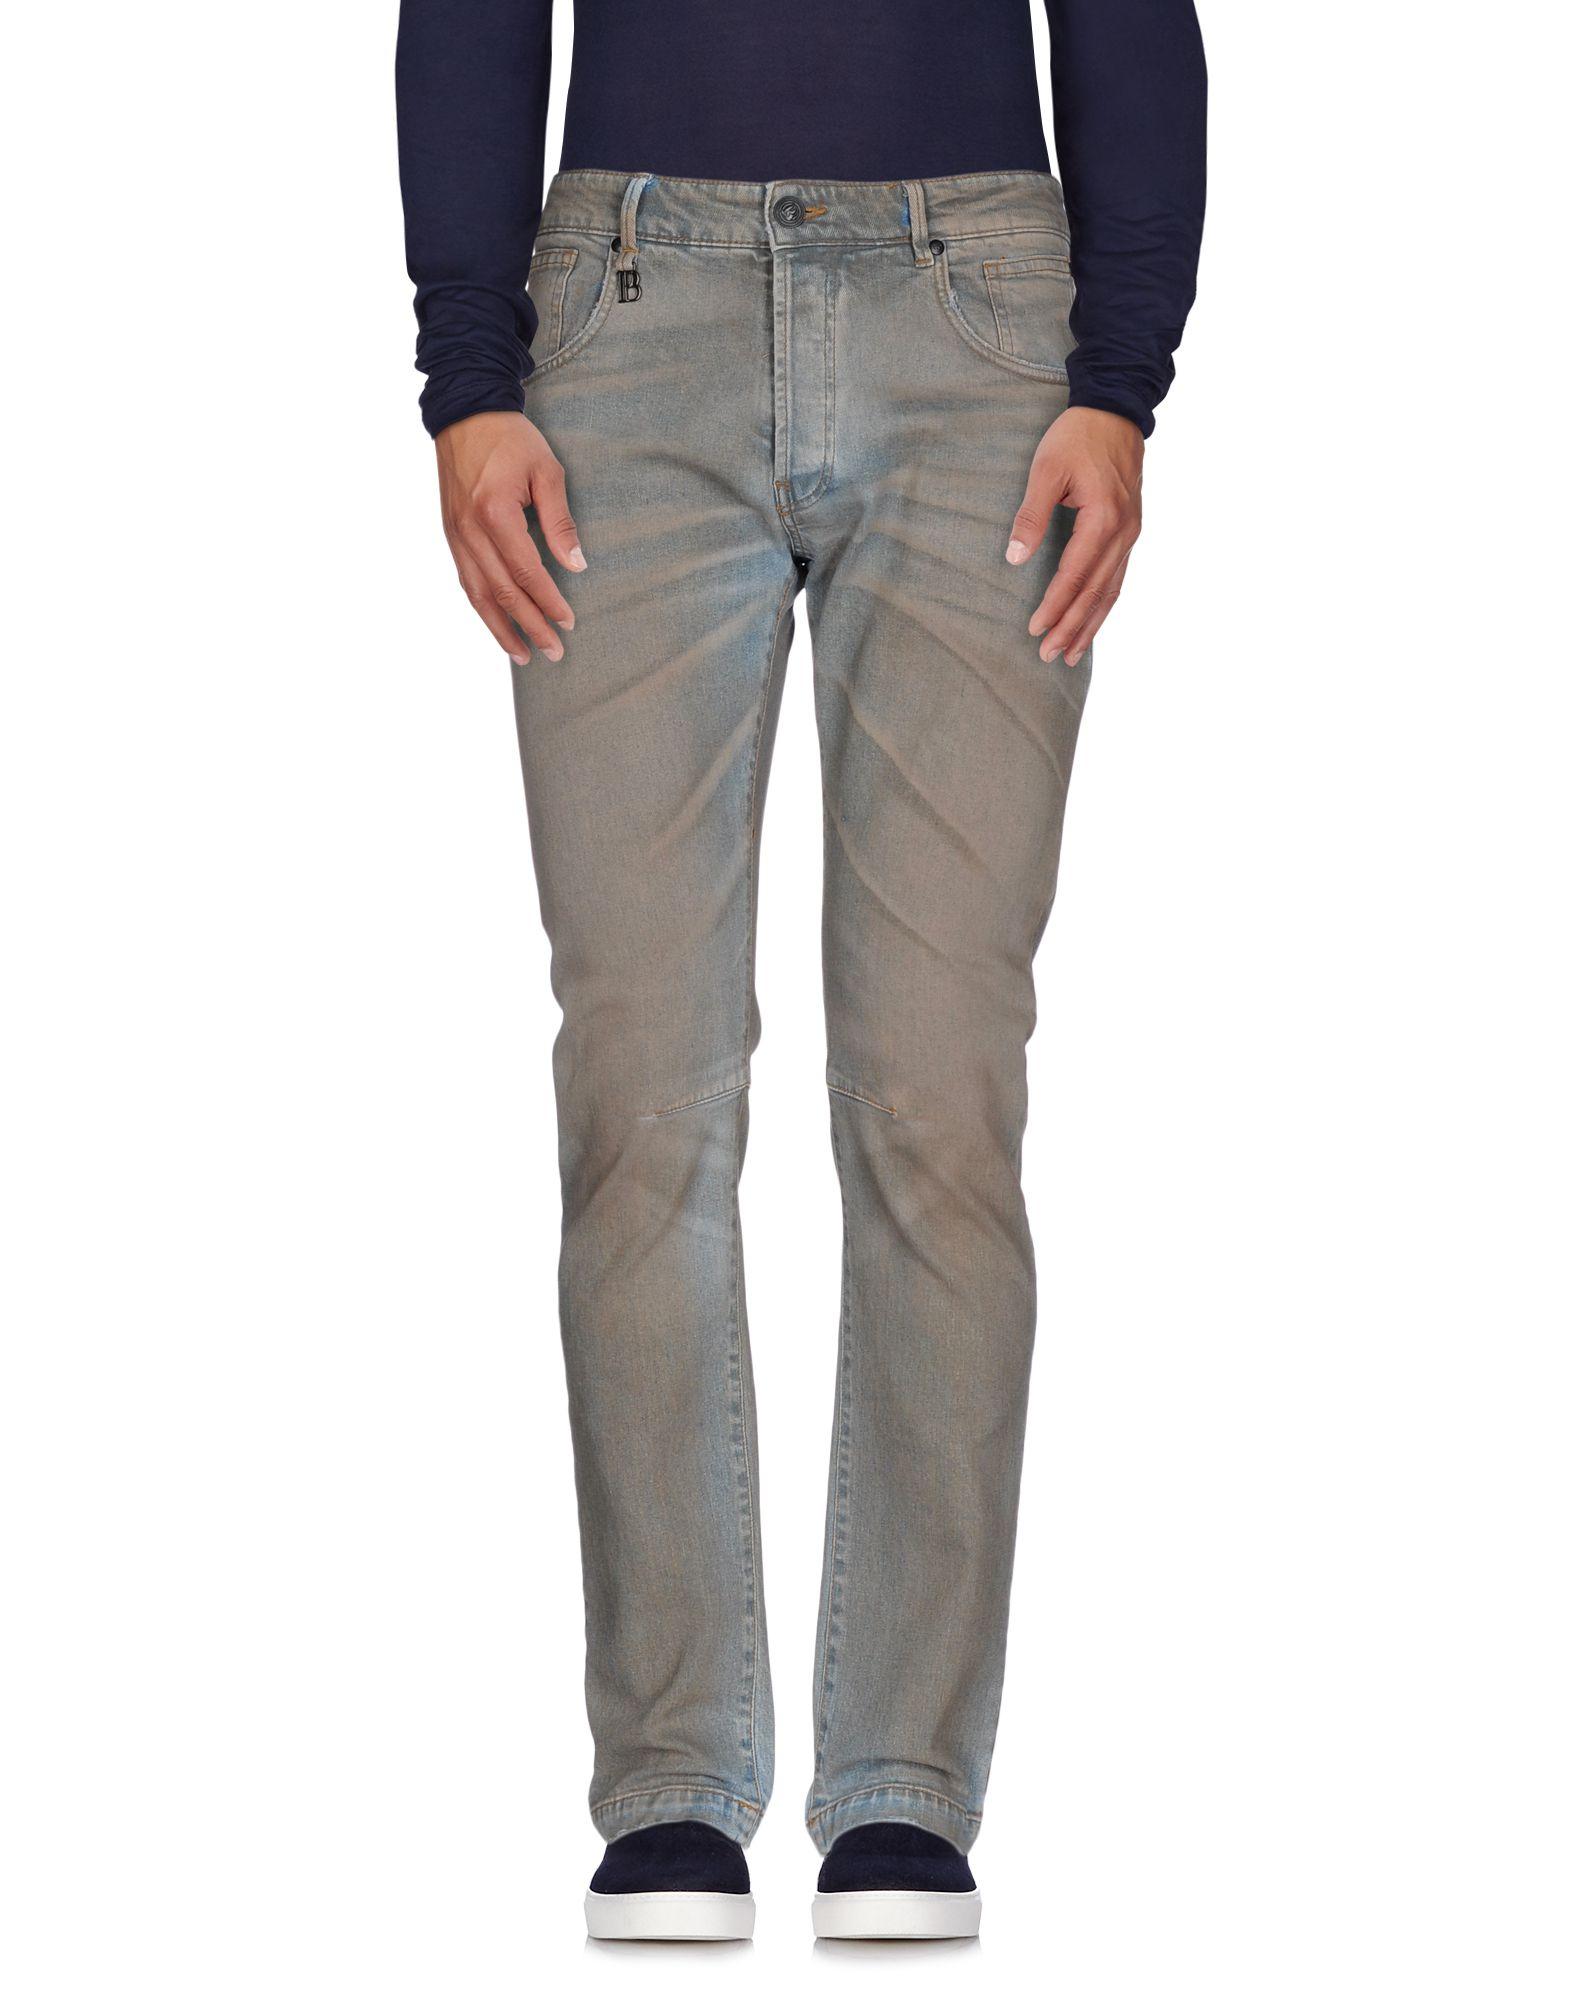 Pantaloni Jeans Pierre Balmain Donna - Acquista online su